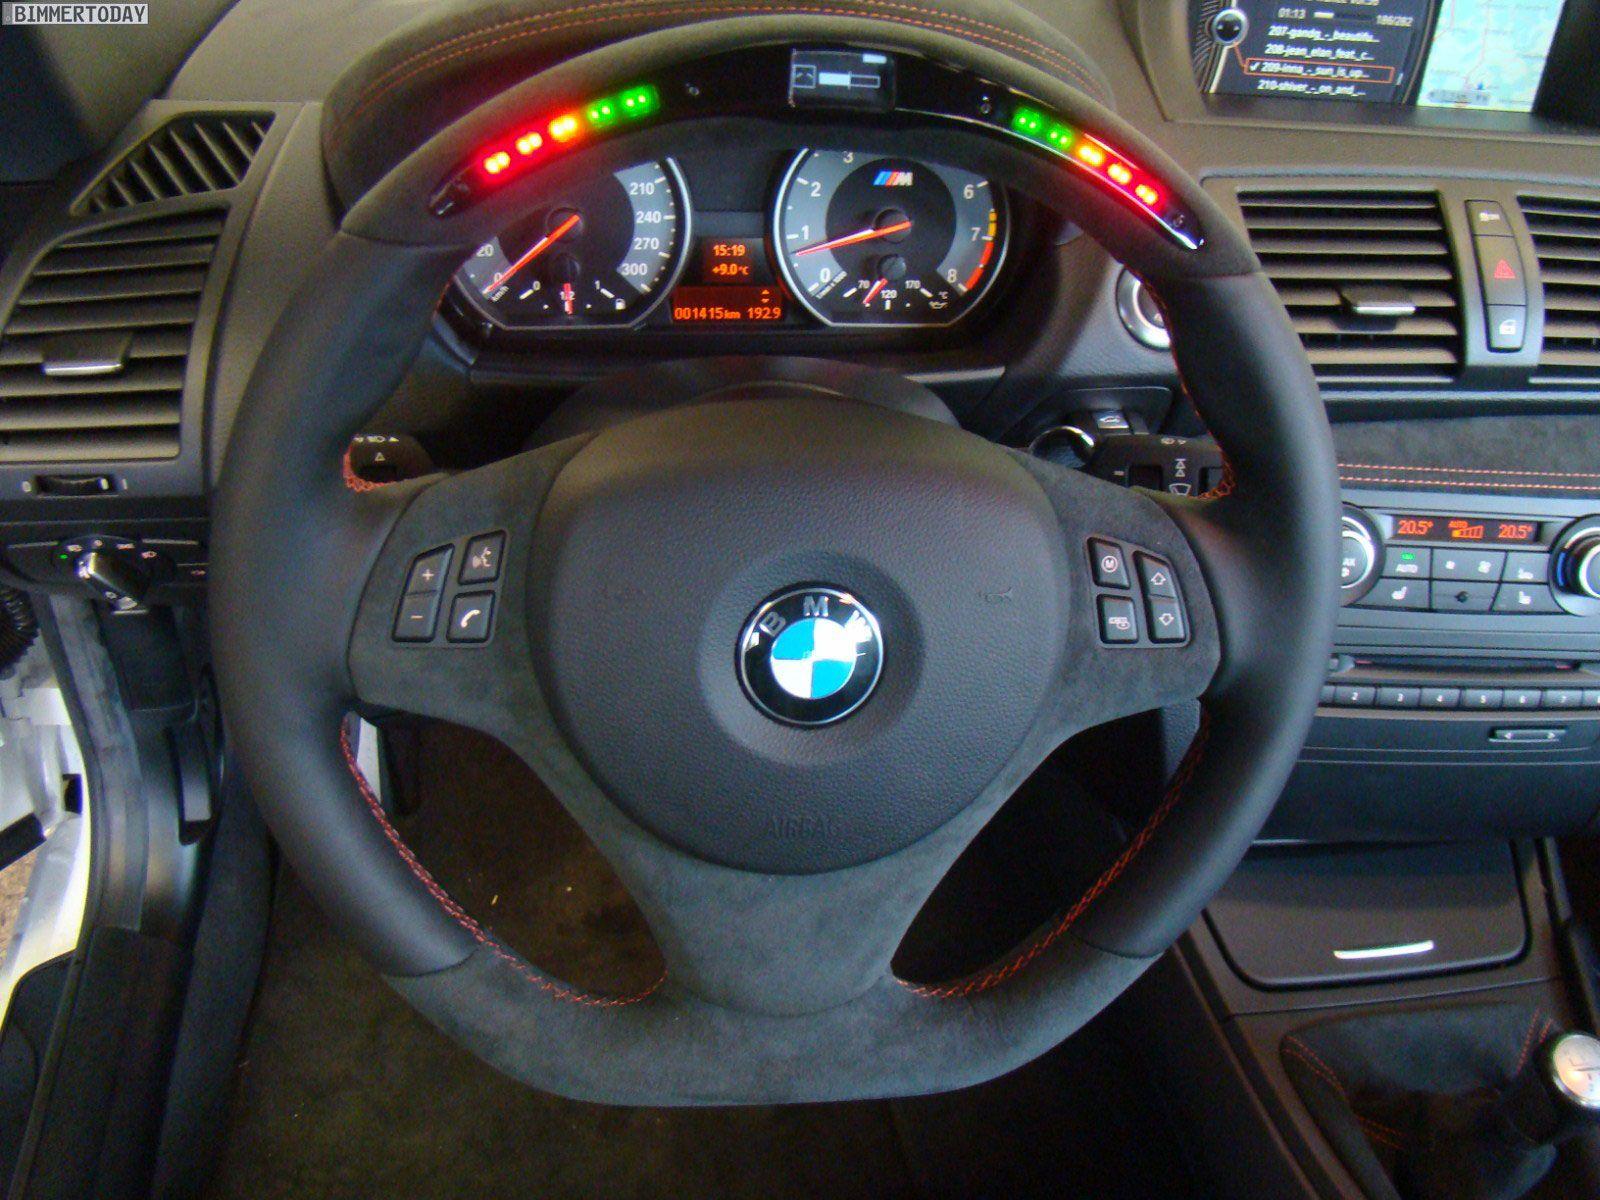 Tvw Car Design Bmw 1 Series M Interior Steering Wheel Details With